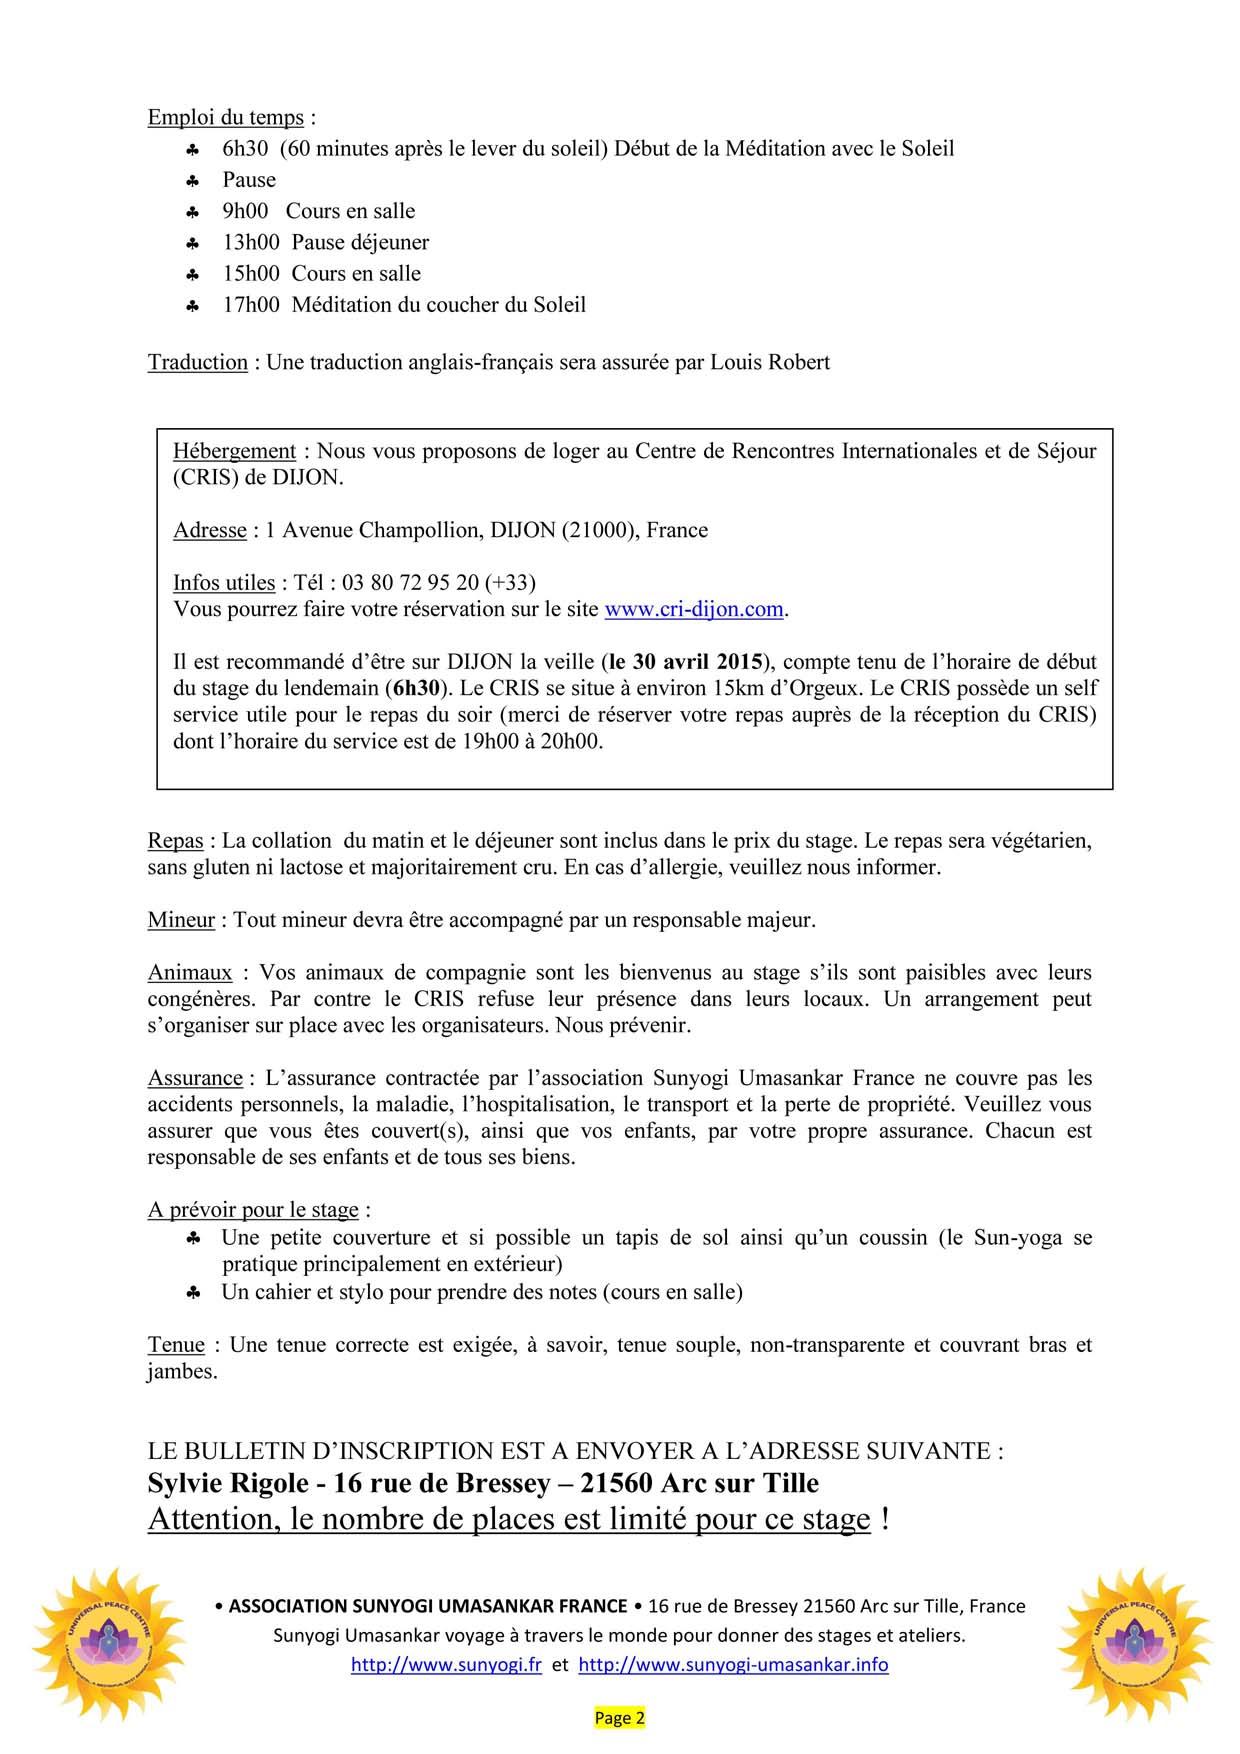 02_ SUNYOGA 1, 2, 3 mai 2015 BULLETIN INSCRIPTION b